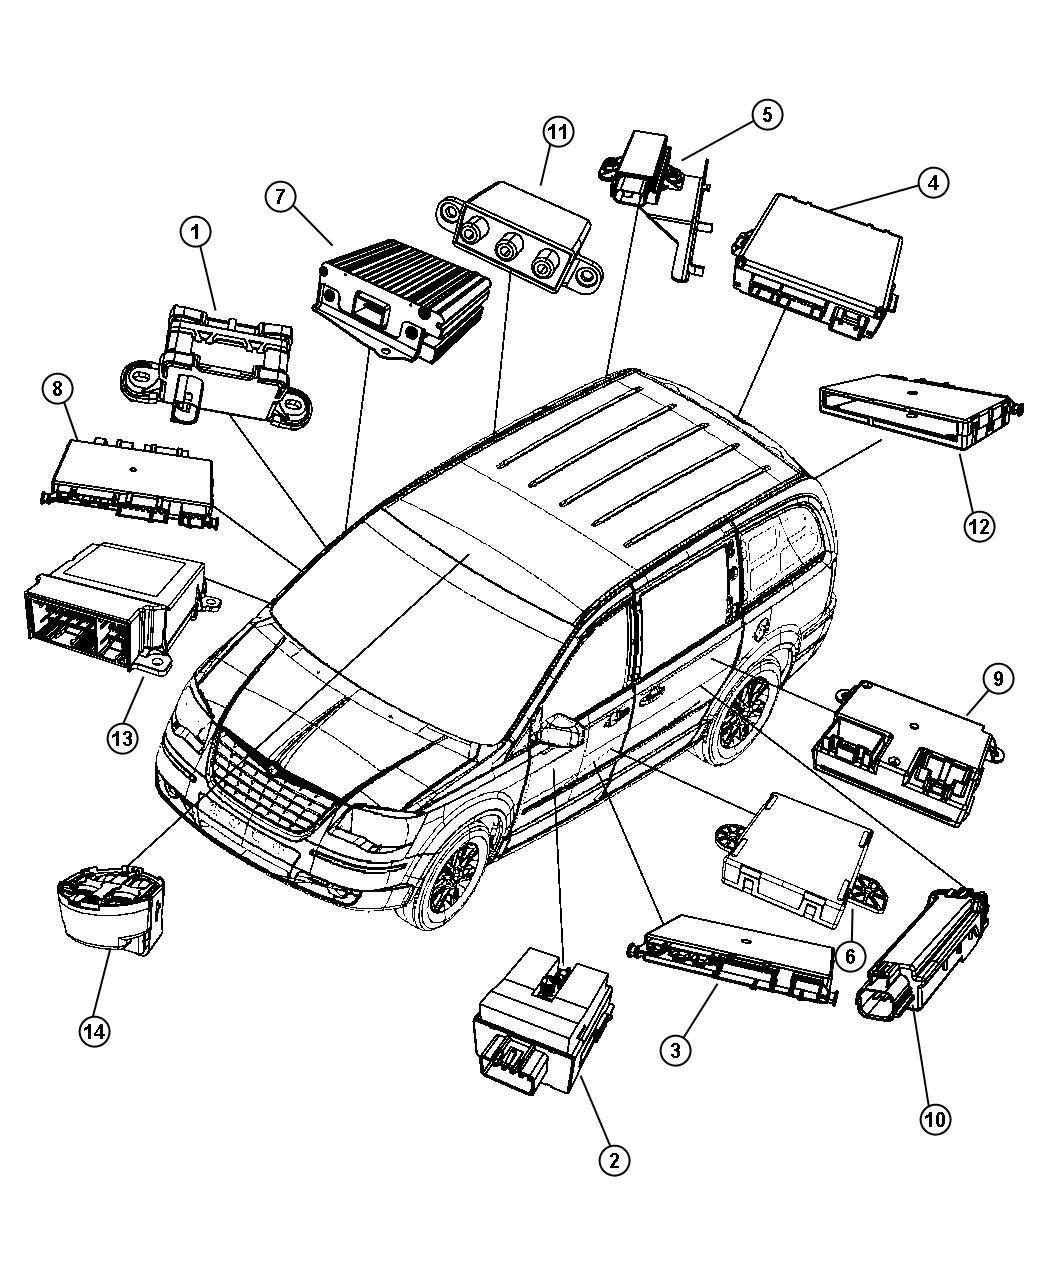 Diagram For Dodge Caravan 2 4l Fuse Box